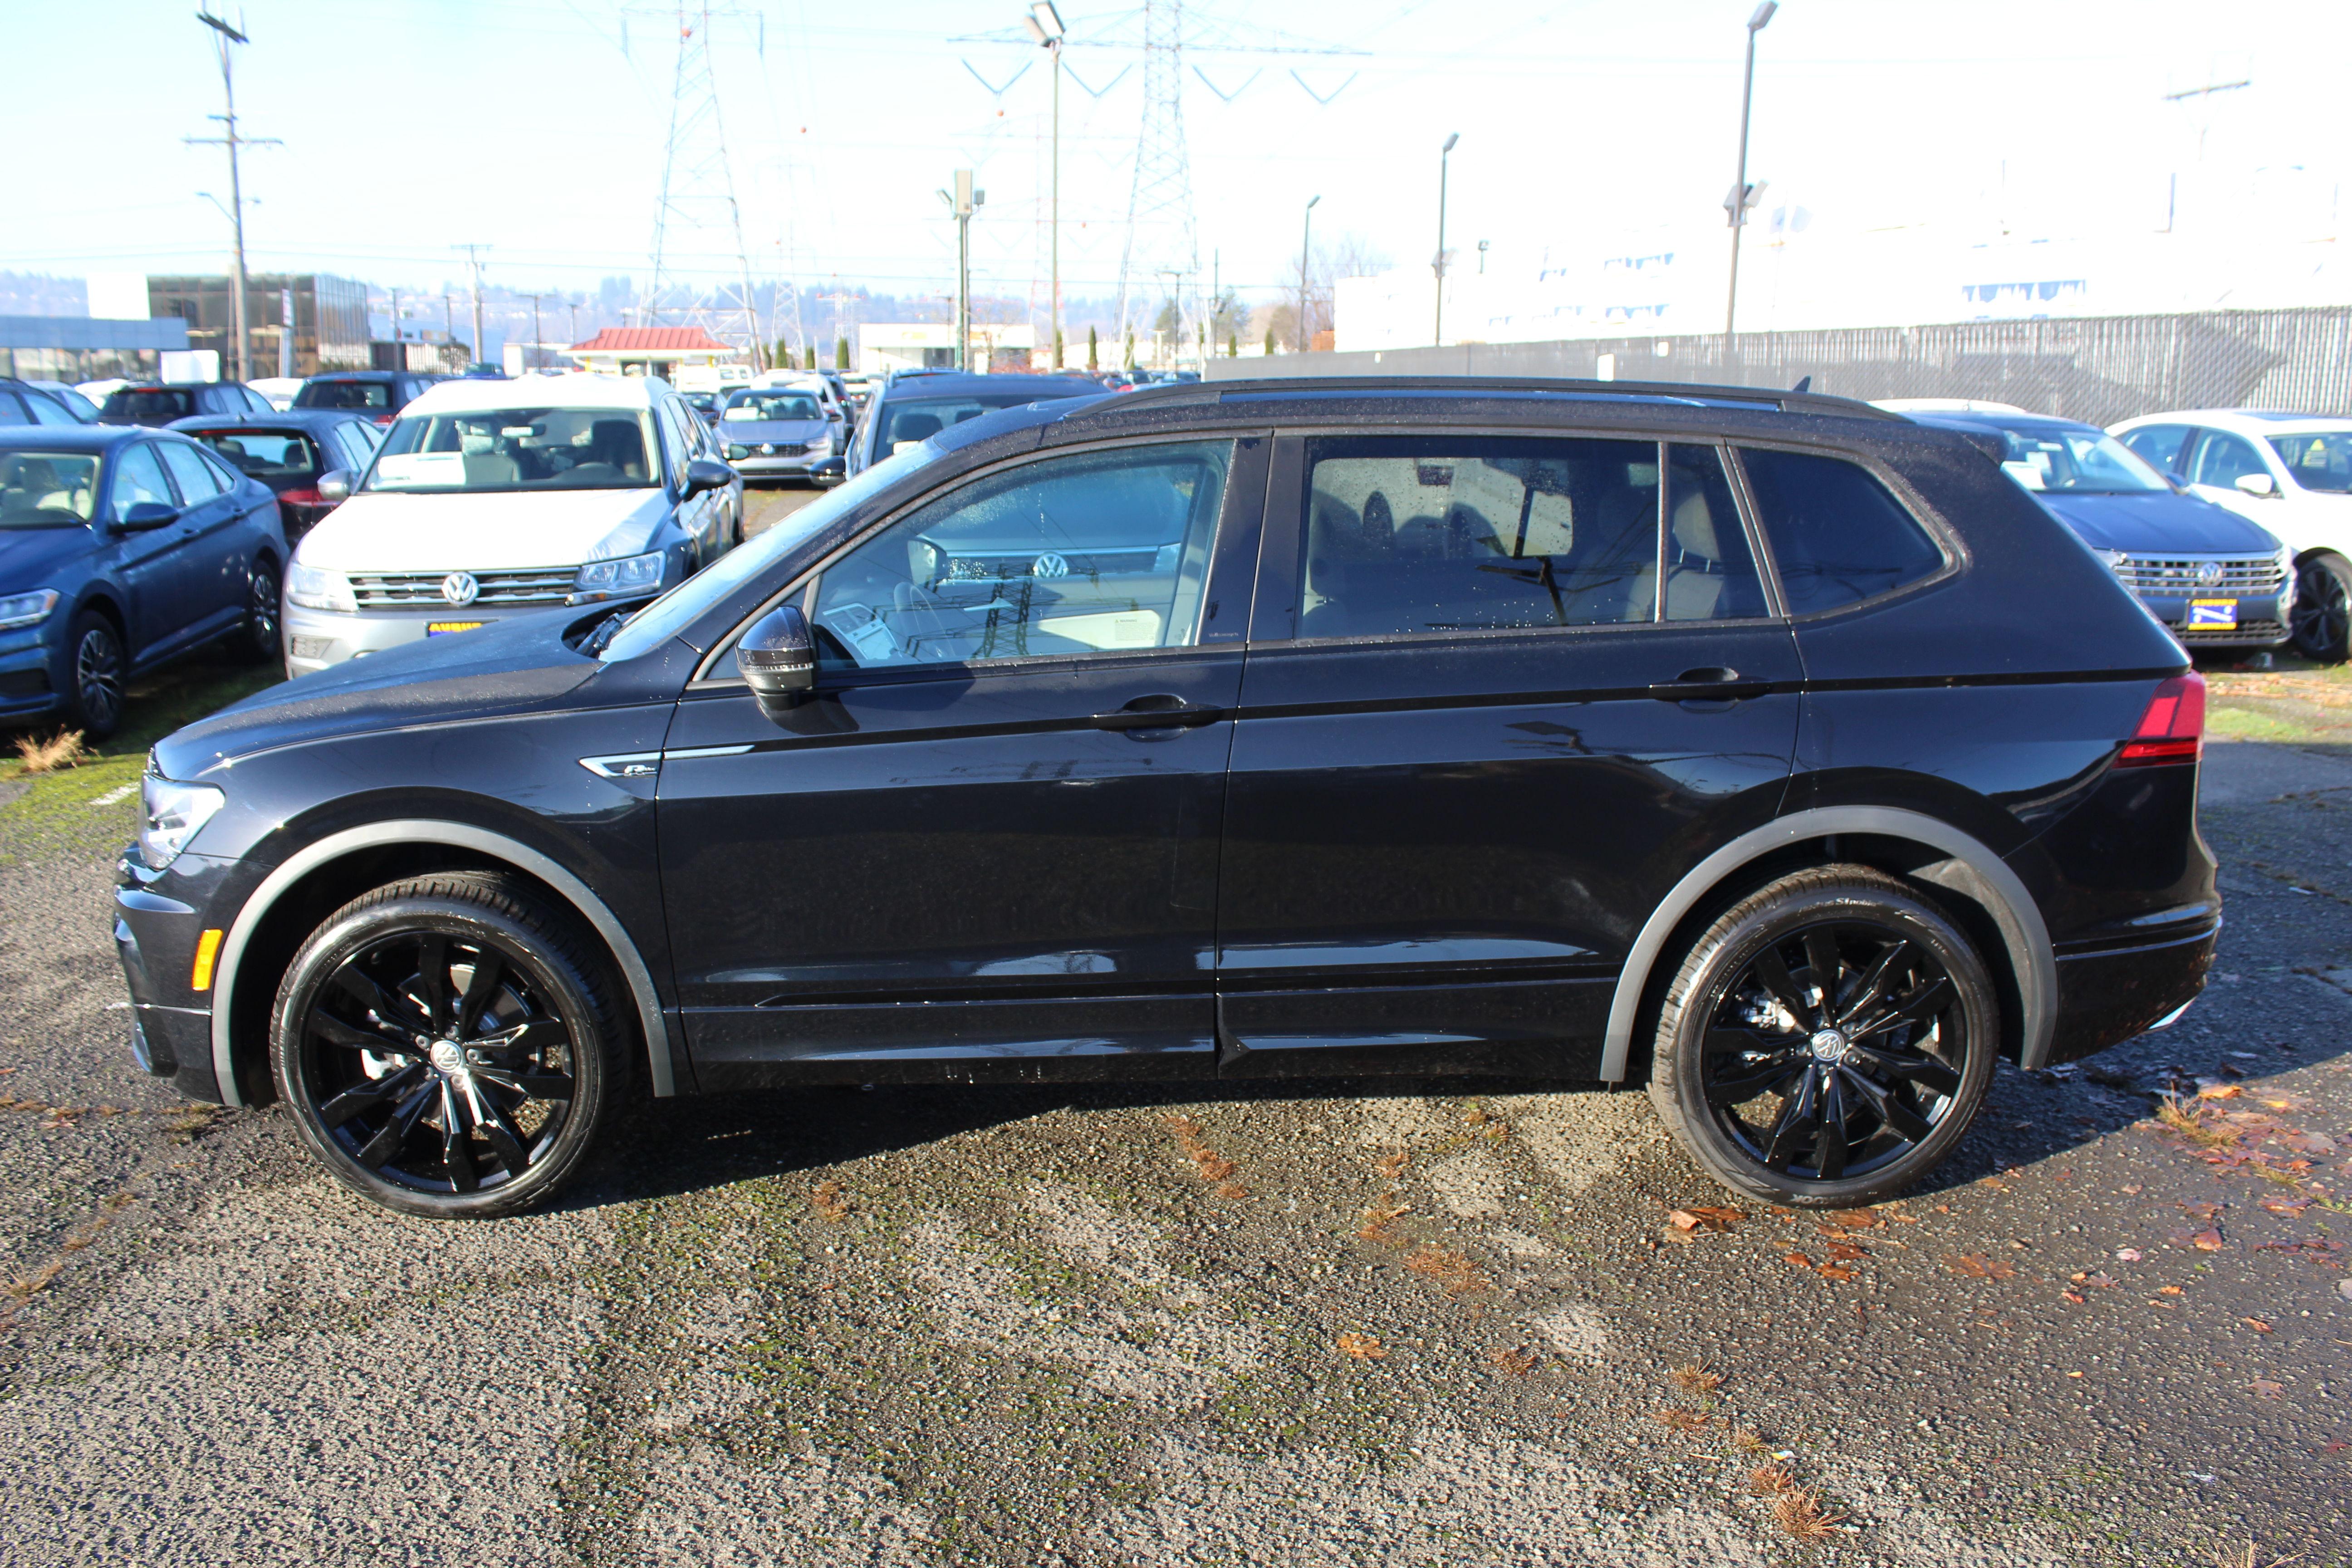 New 2021 Volkswagen Tiguan 2.0T SE R-Line Black 4Motion 4D ...